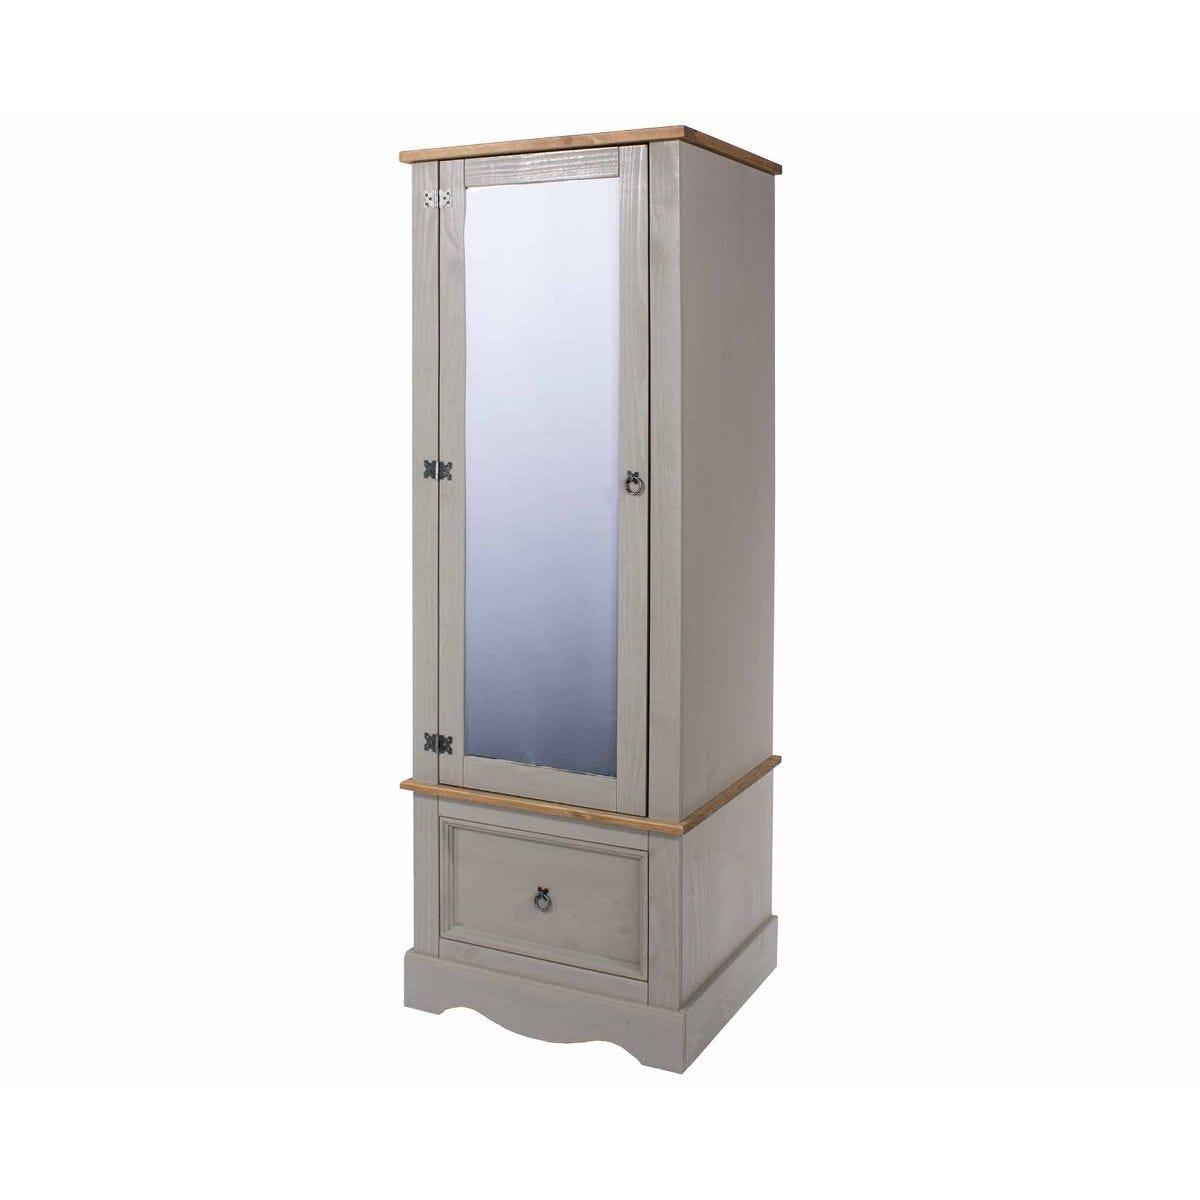 Corona Grey Wardrobe with Mirrored Door, Grey